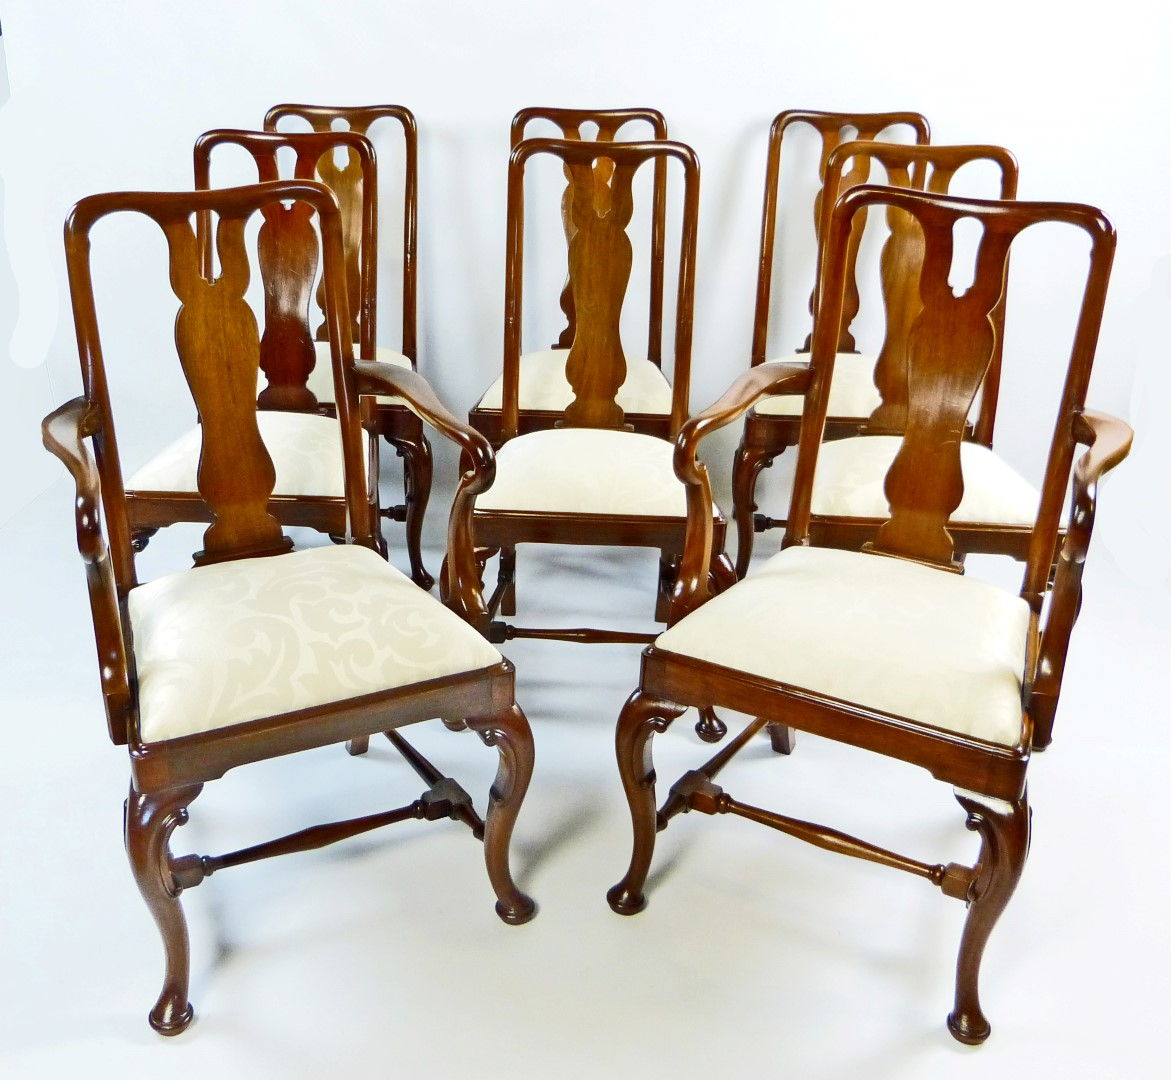 Antique Dining Chair Set of 8 Queen Anne Style - Antique Furniture Antique Cupboards Antique Tables Antique